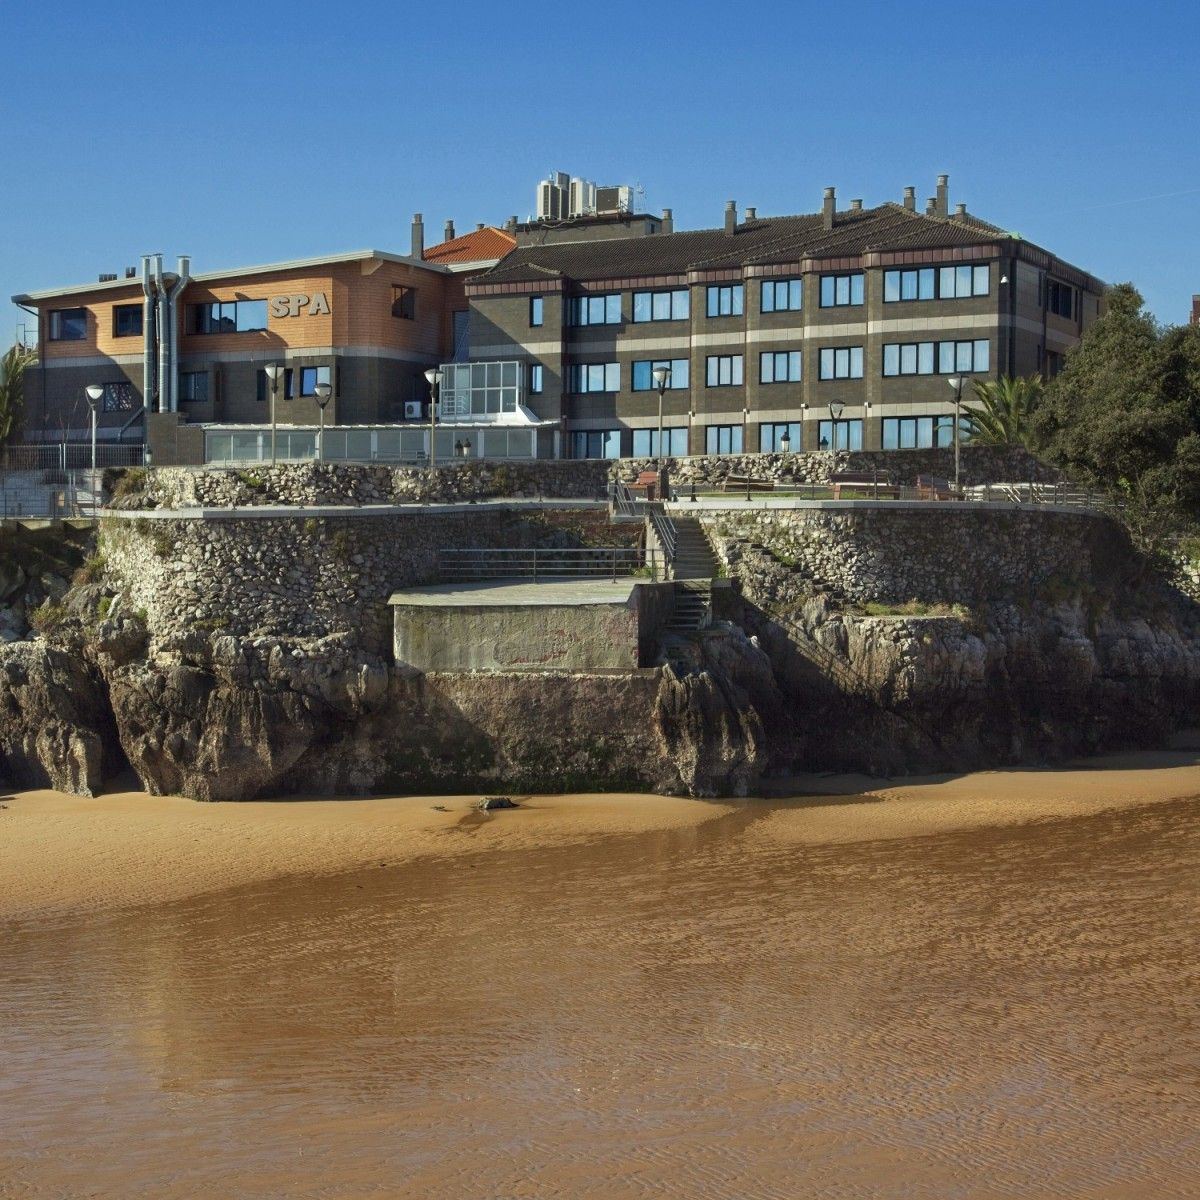 Hotel Isla Bella Spa  #Isla #cantabria #Spain #España